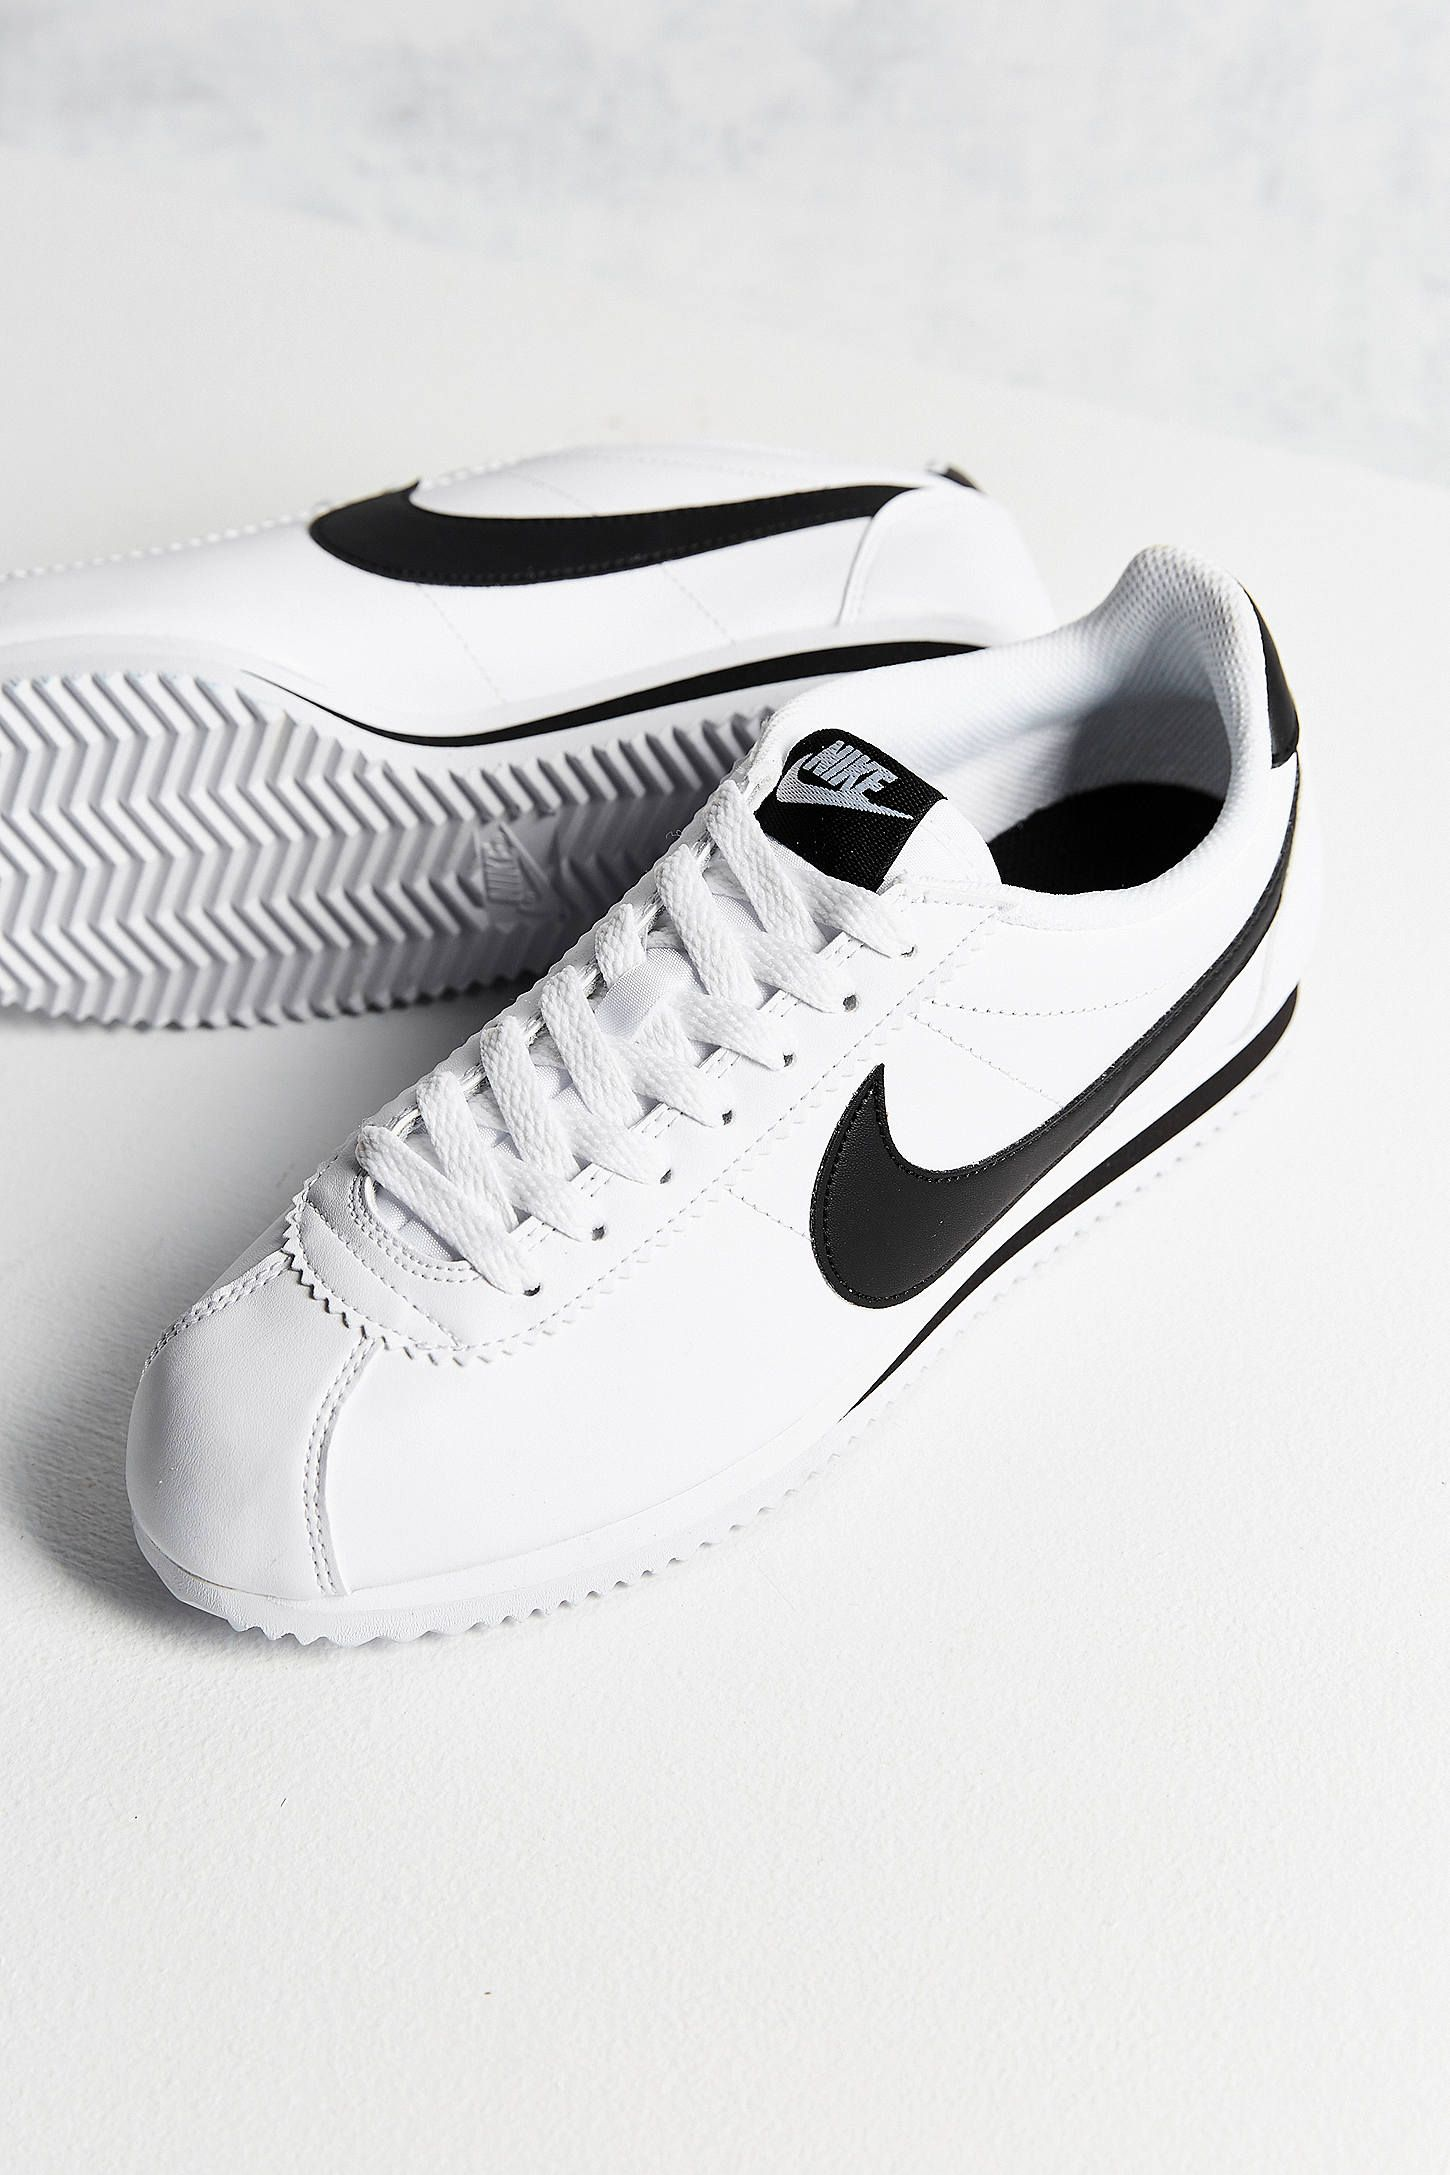 Slide View: 1: Nike Classic Cortez Sneaker Pinterest